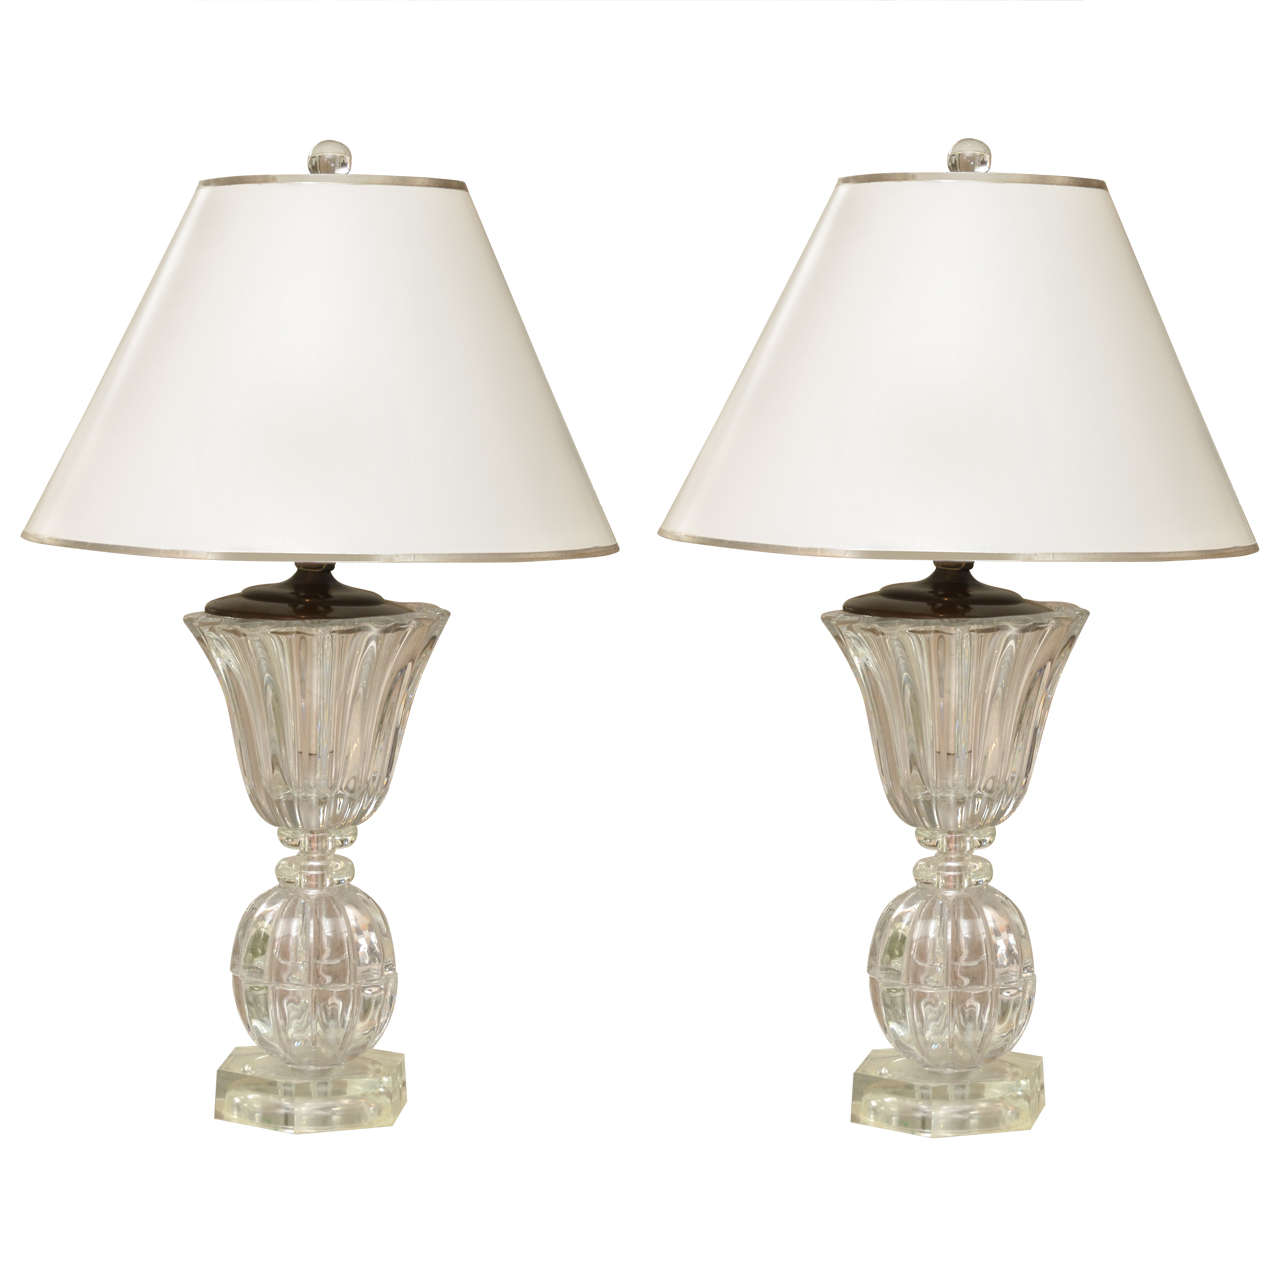 Pair of Crystal Art Deco Lamps 1